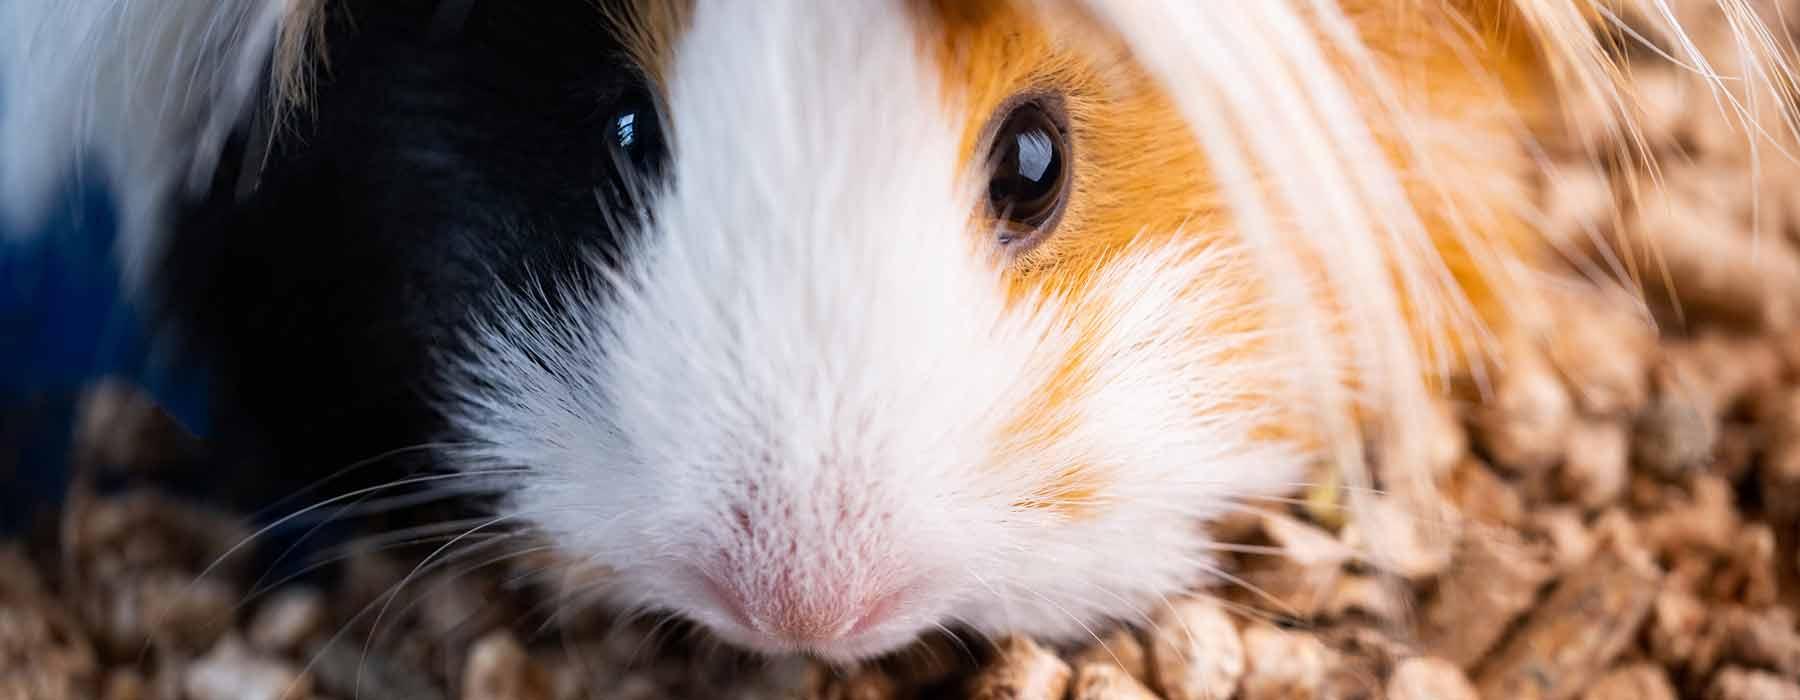 long-haired guinea pig on pine pellets